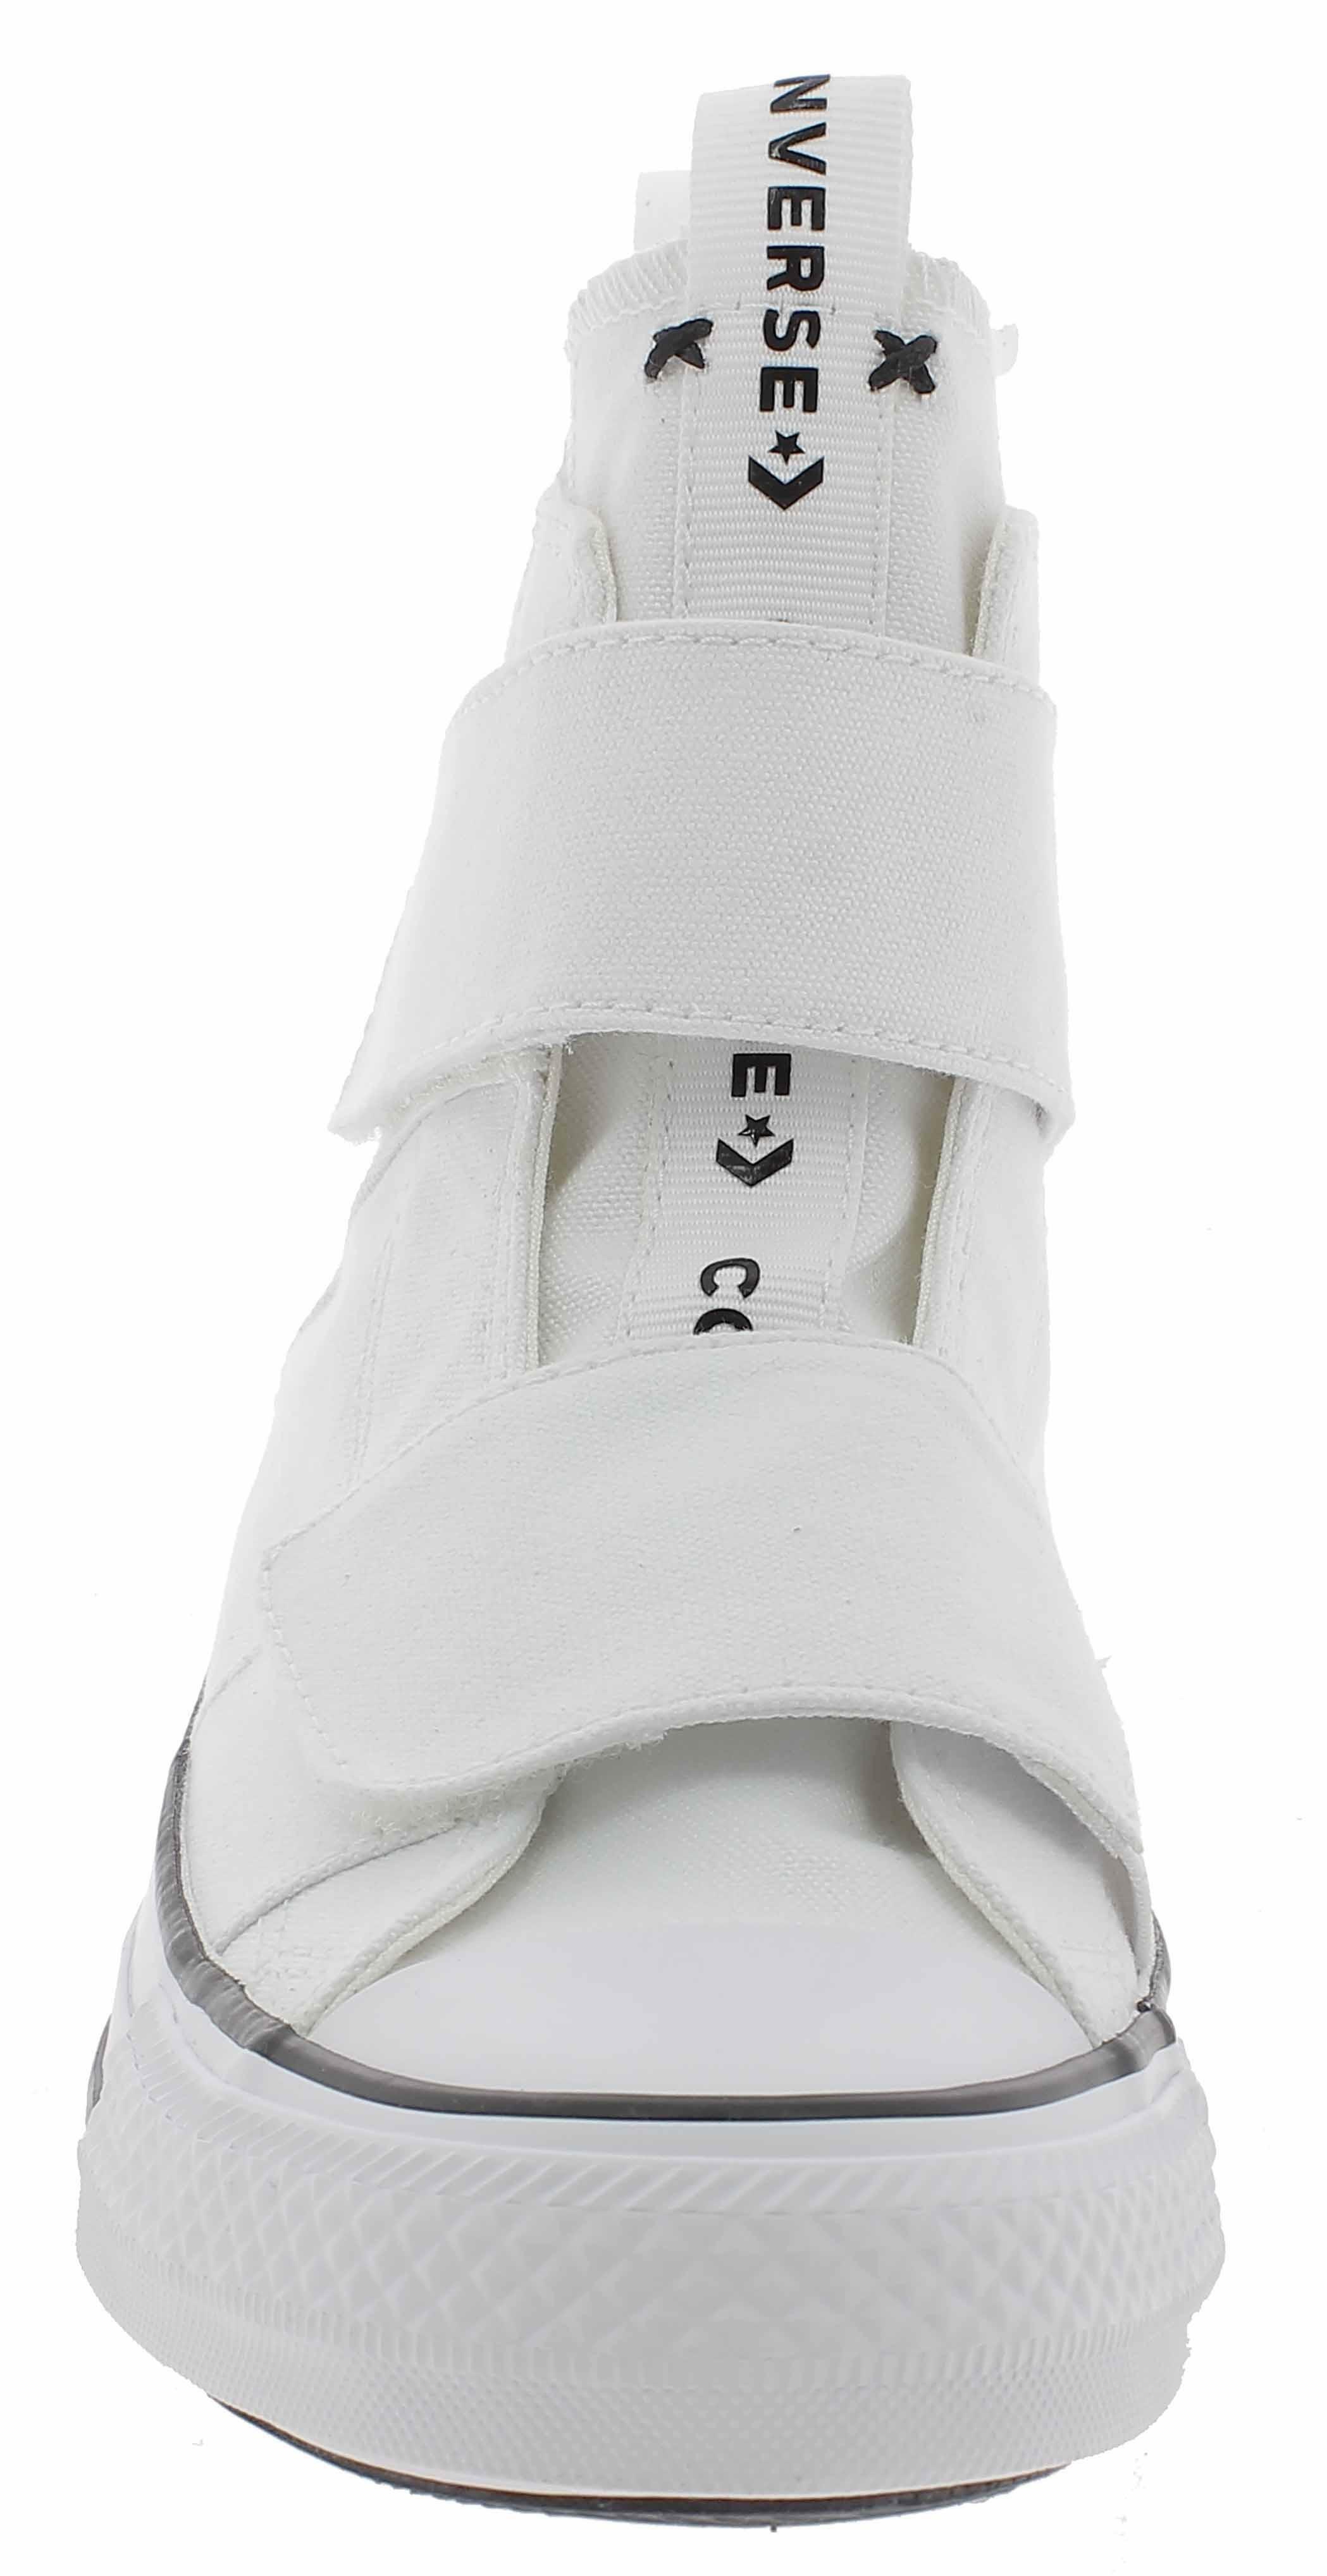 converse ctas strap hi scarpe sportive donna bianche 164547c